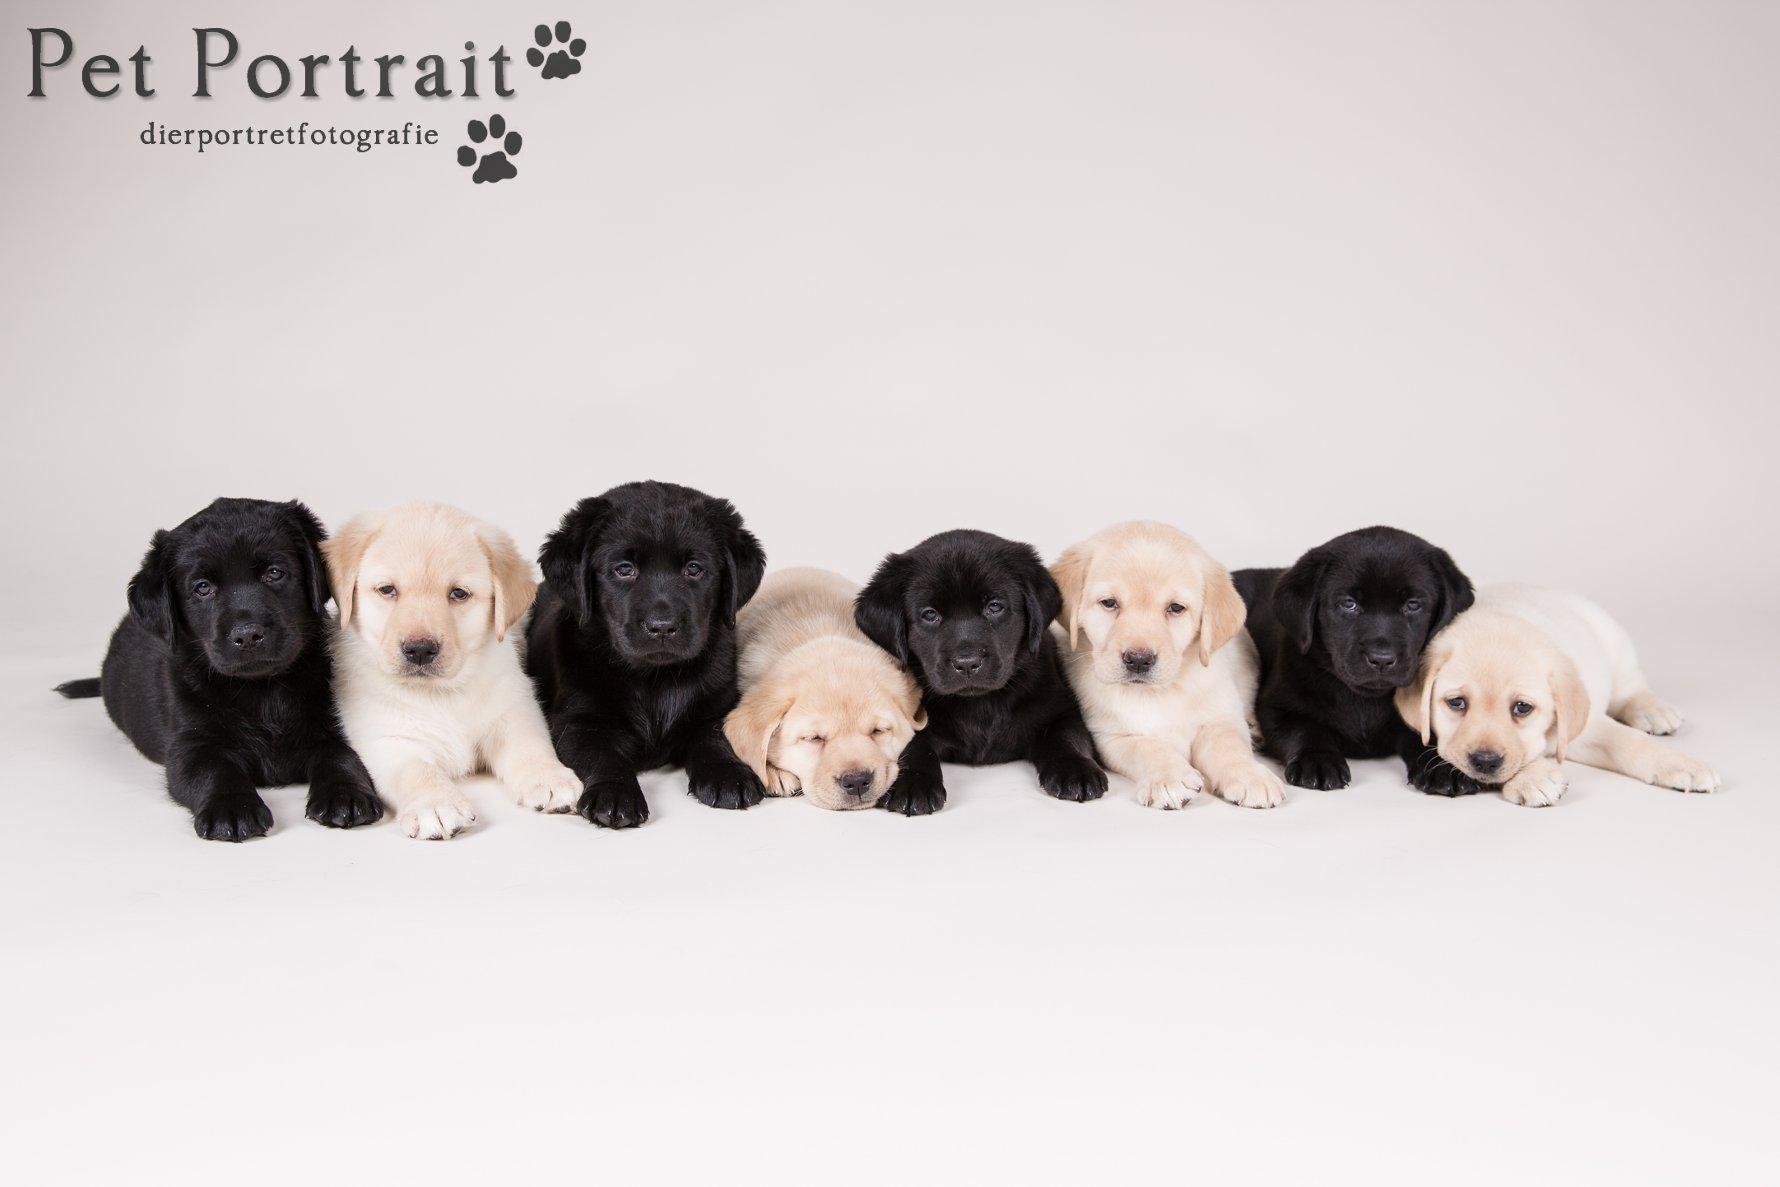 Hondenfotograaf Hillegom - Nestfotoshoot Labrador retriever pups